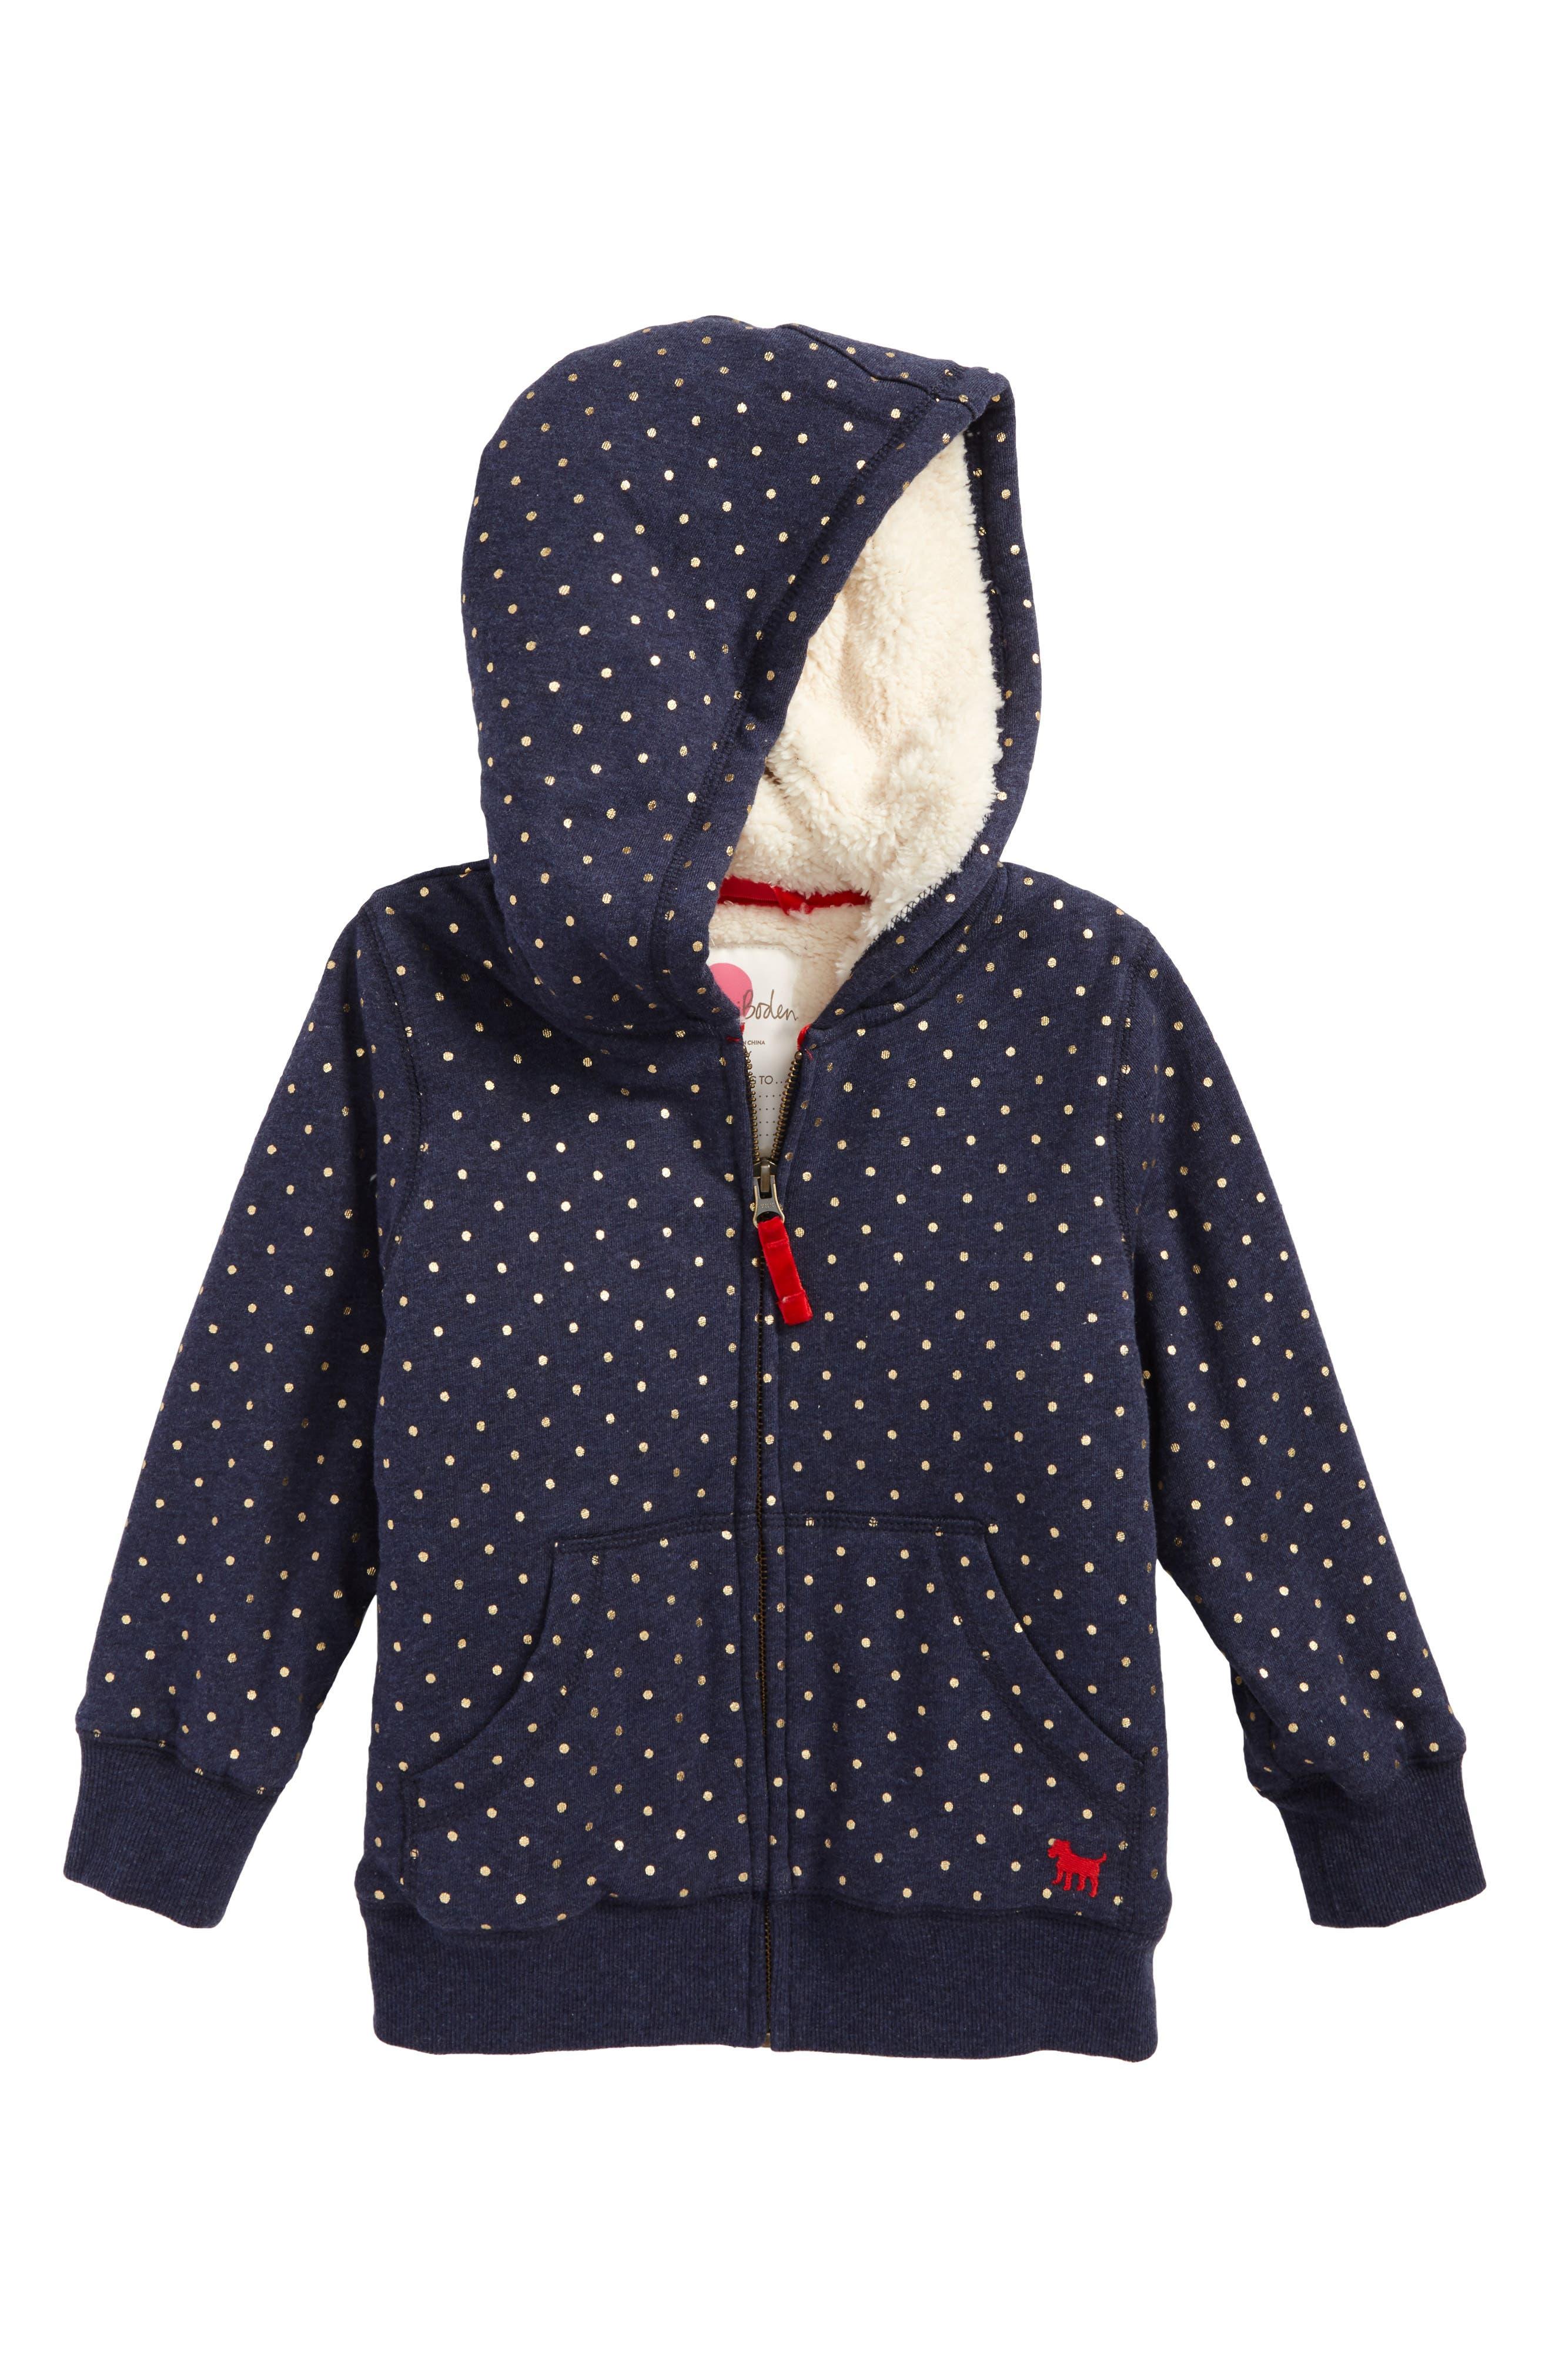 Main Image - Boden Print Shaggy Lined Hoodie (Toddler Girls, Little Girls & Big Girls)